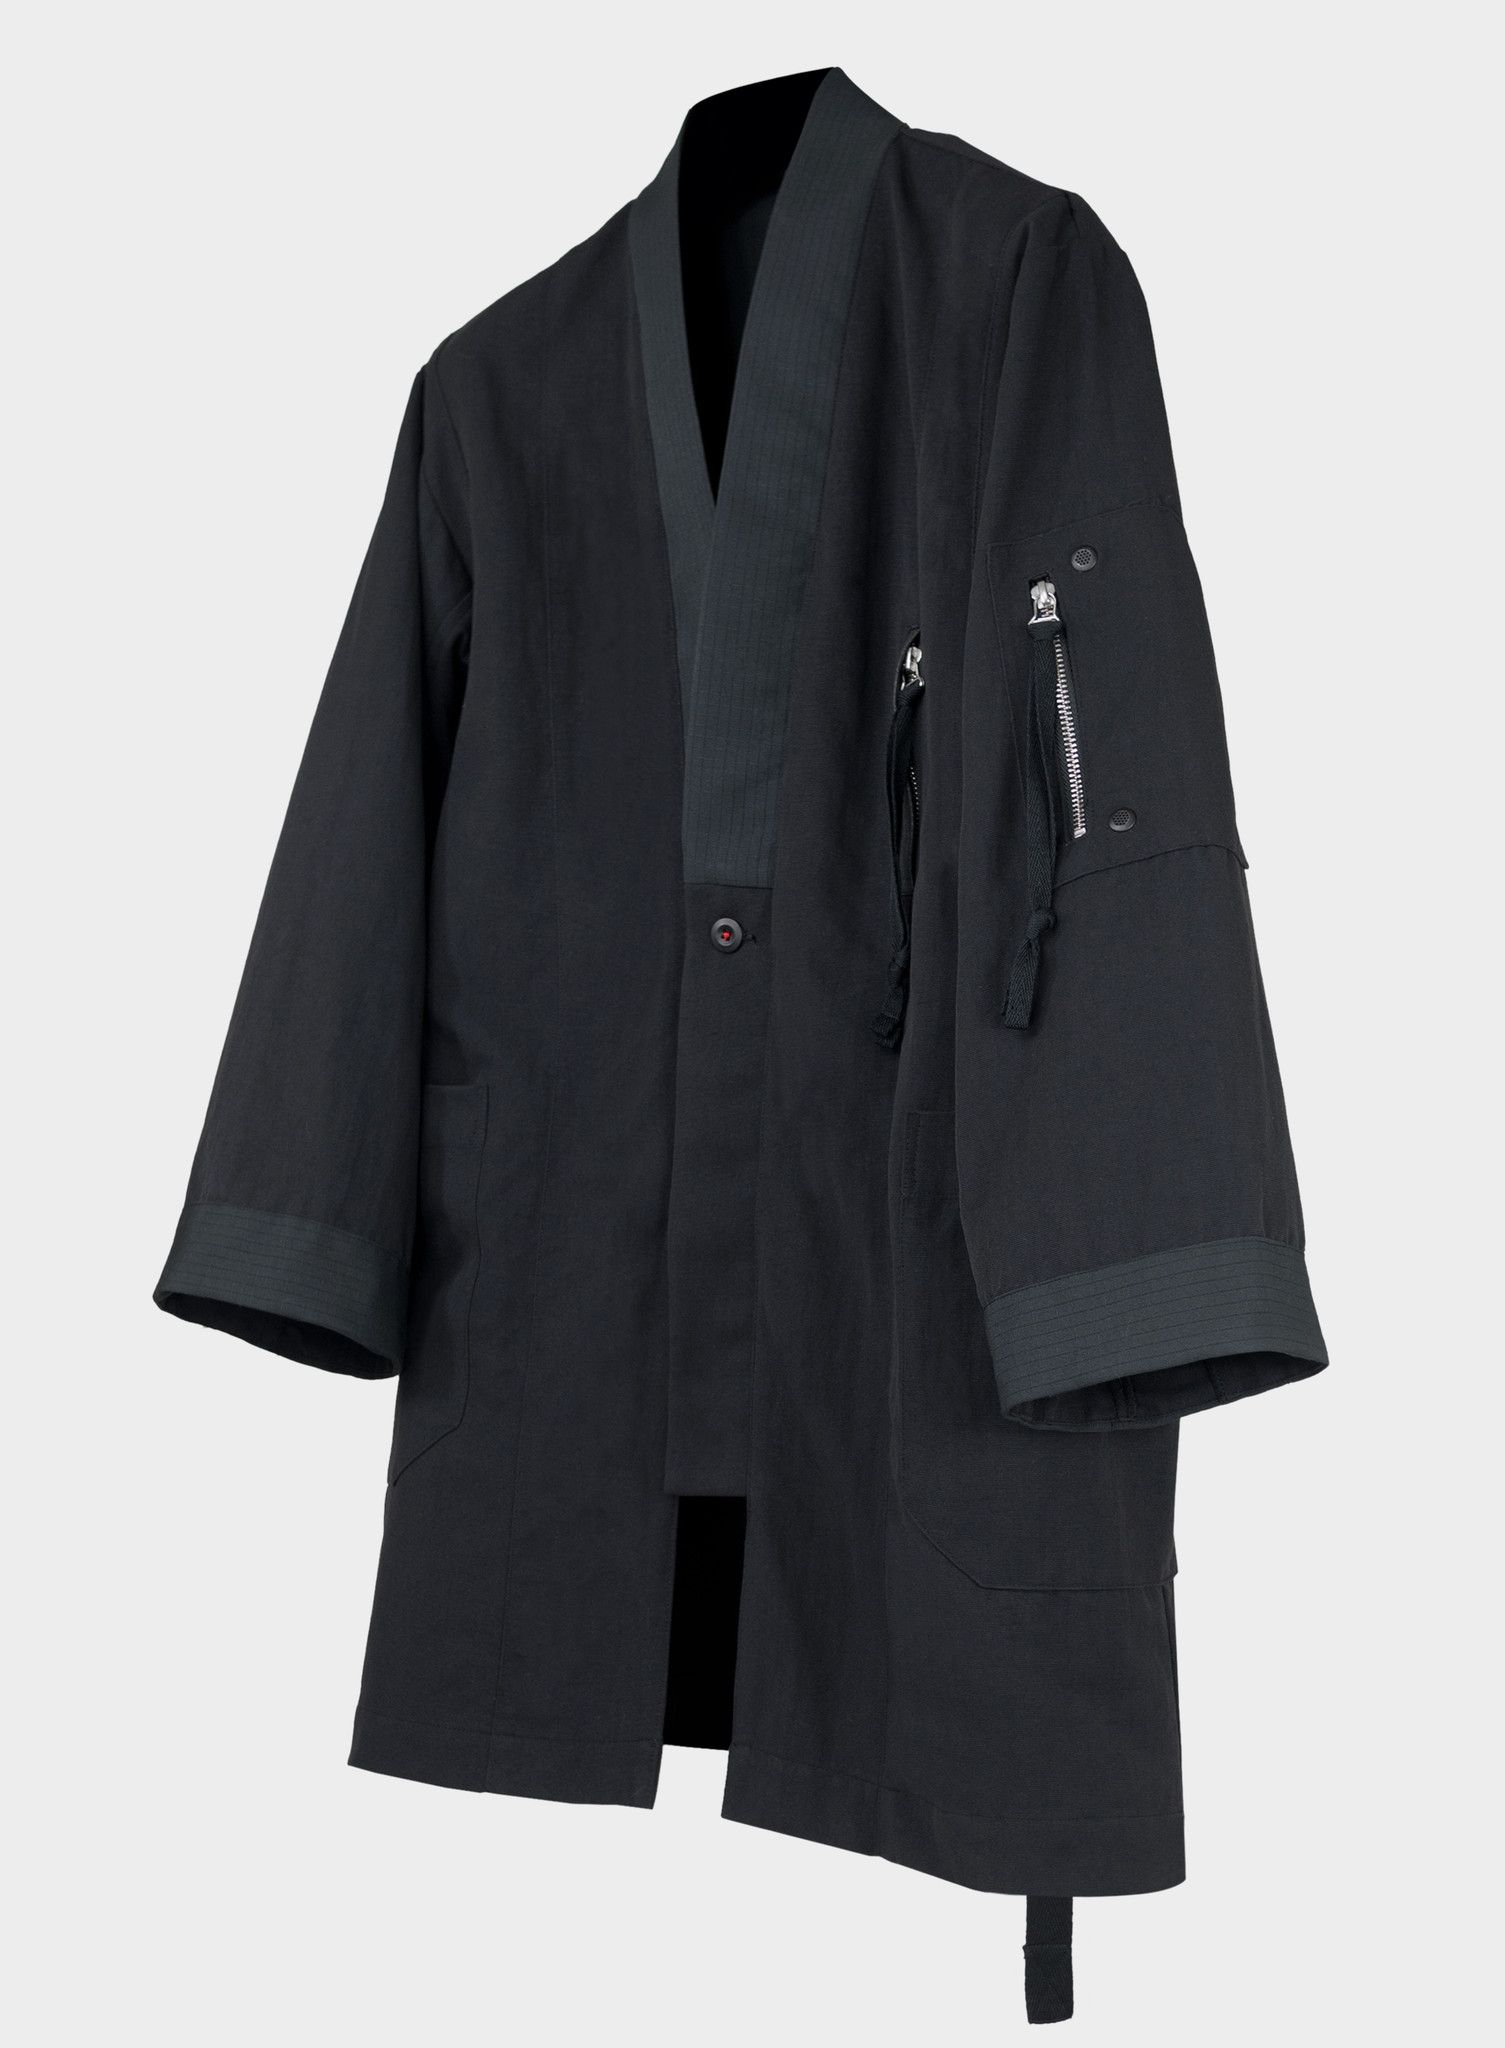 c03928455 Guerrilla-Group – Nightfall Noragi Jacket « Tactical Fanboy | Modern ...